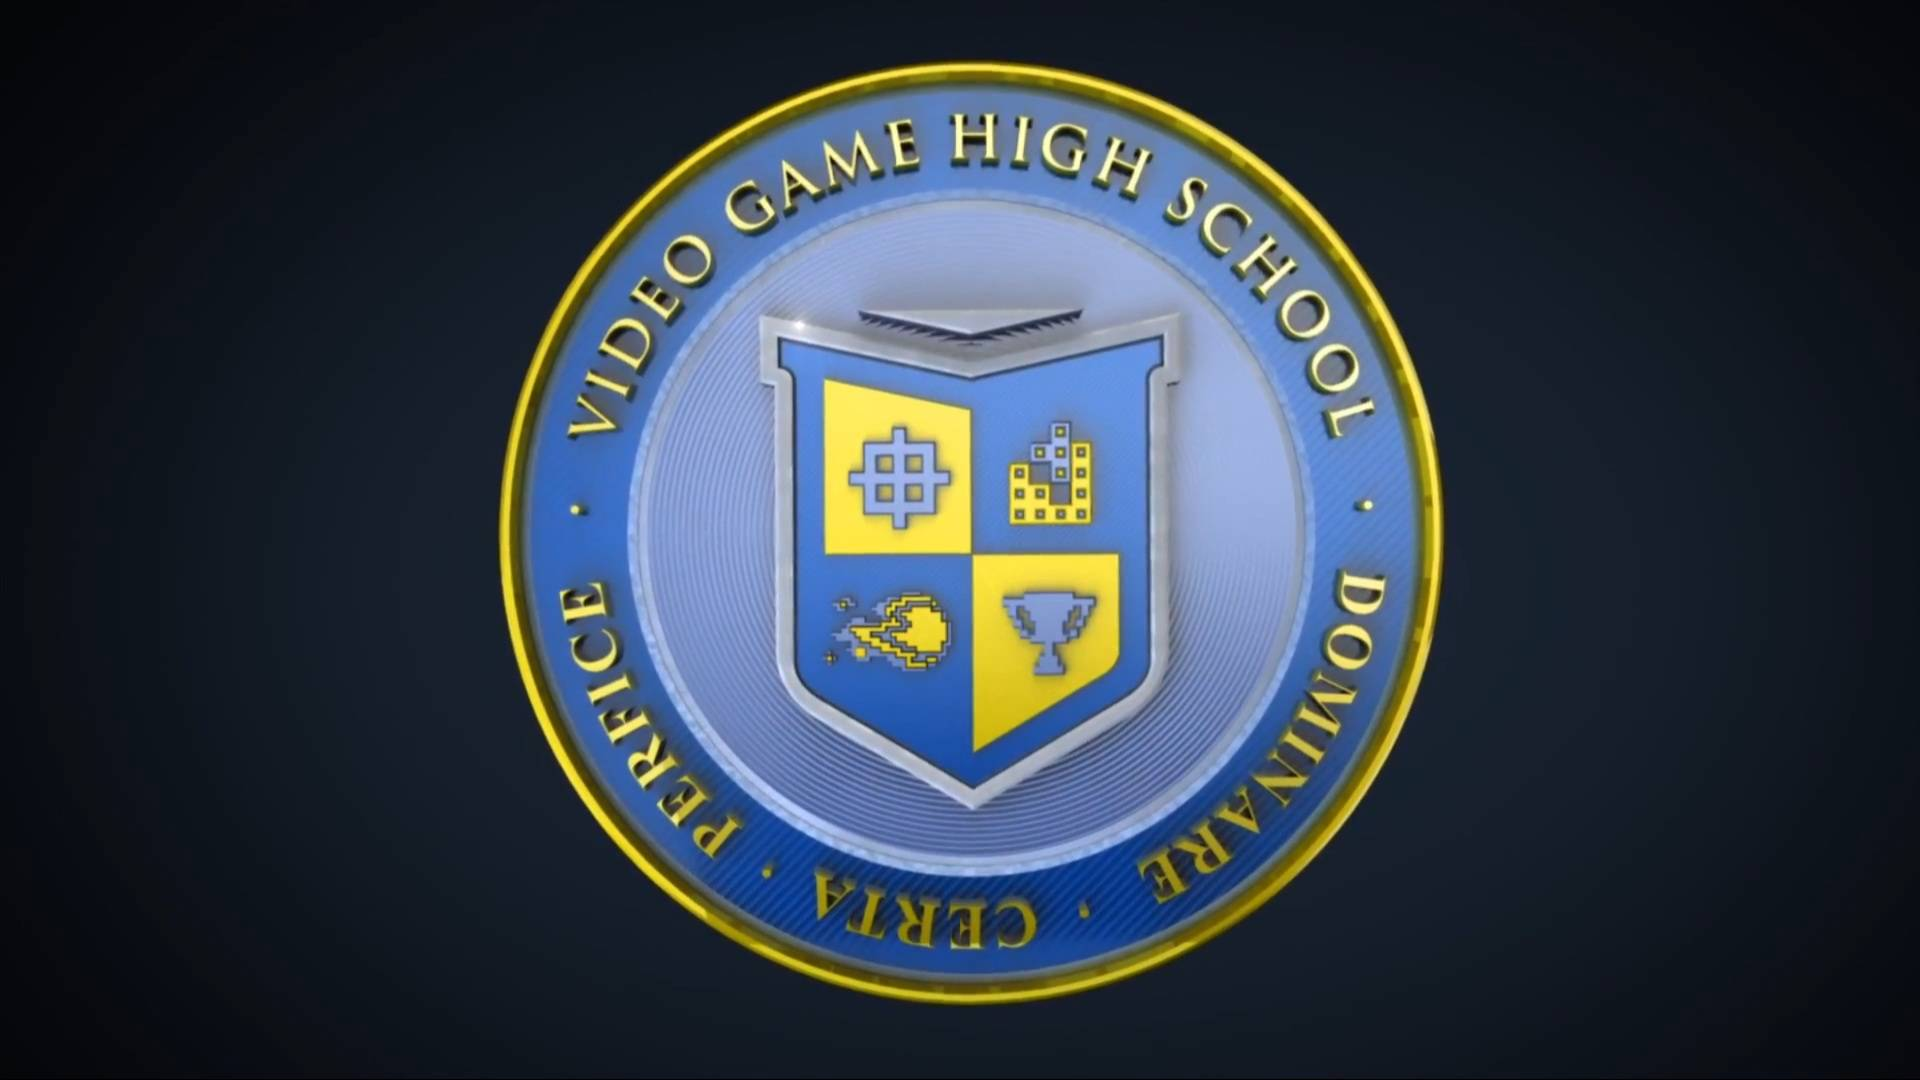 VGHS Video Game High School wallpaper 3